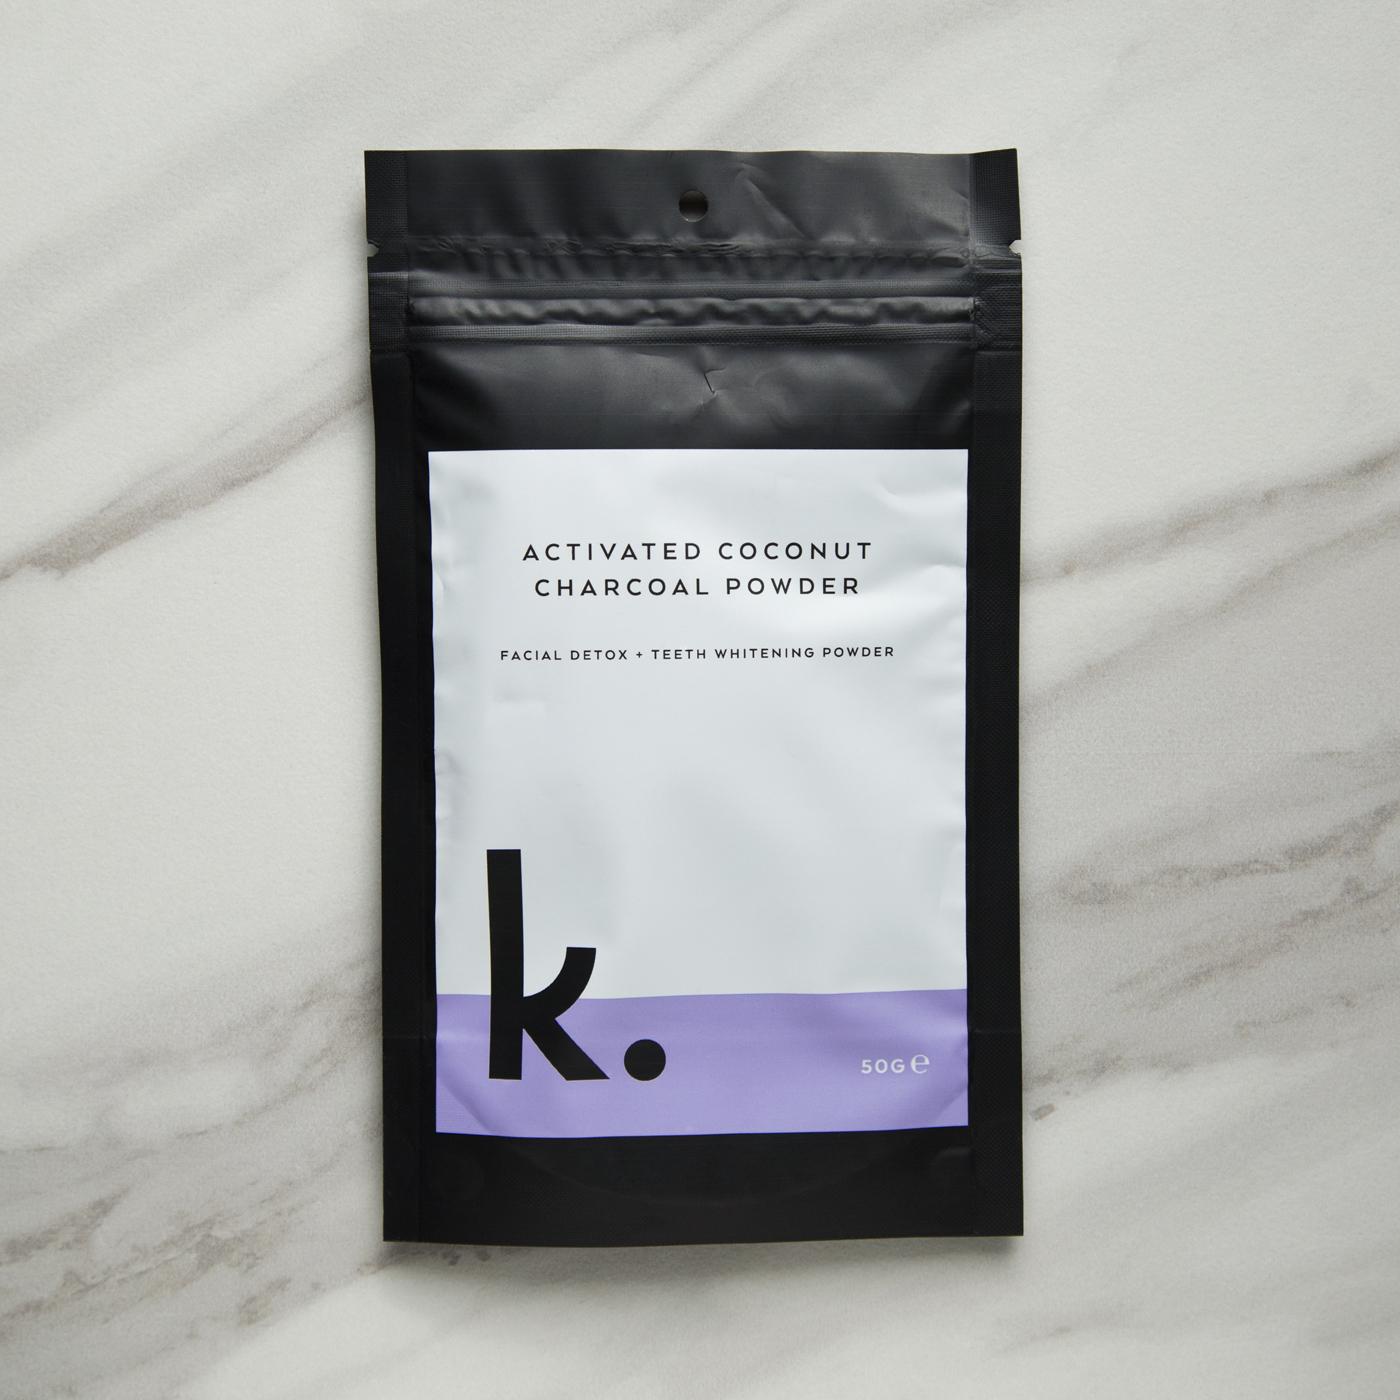 Keeko Activated Coconut Charcoal Powder